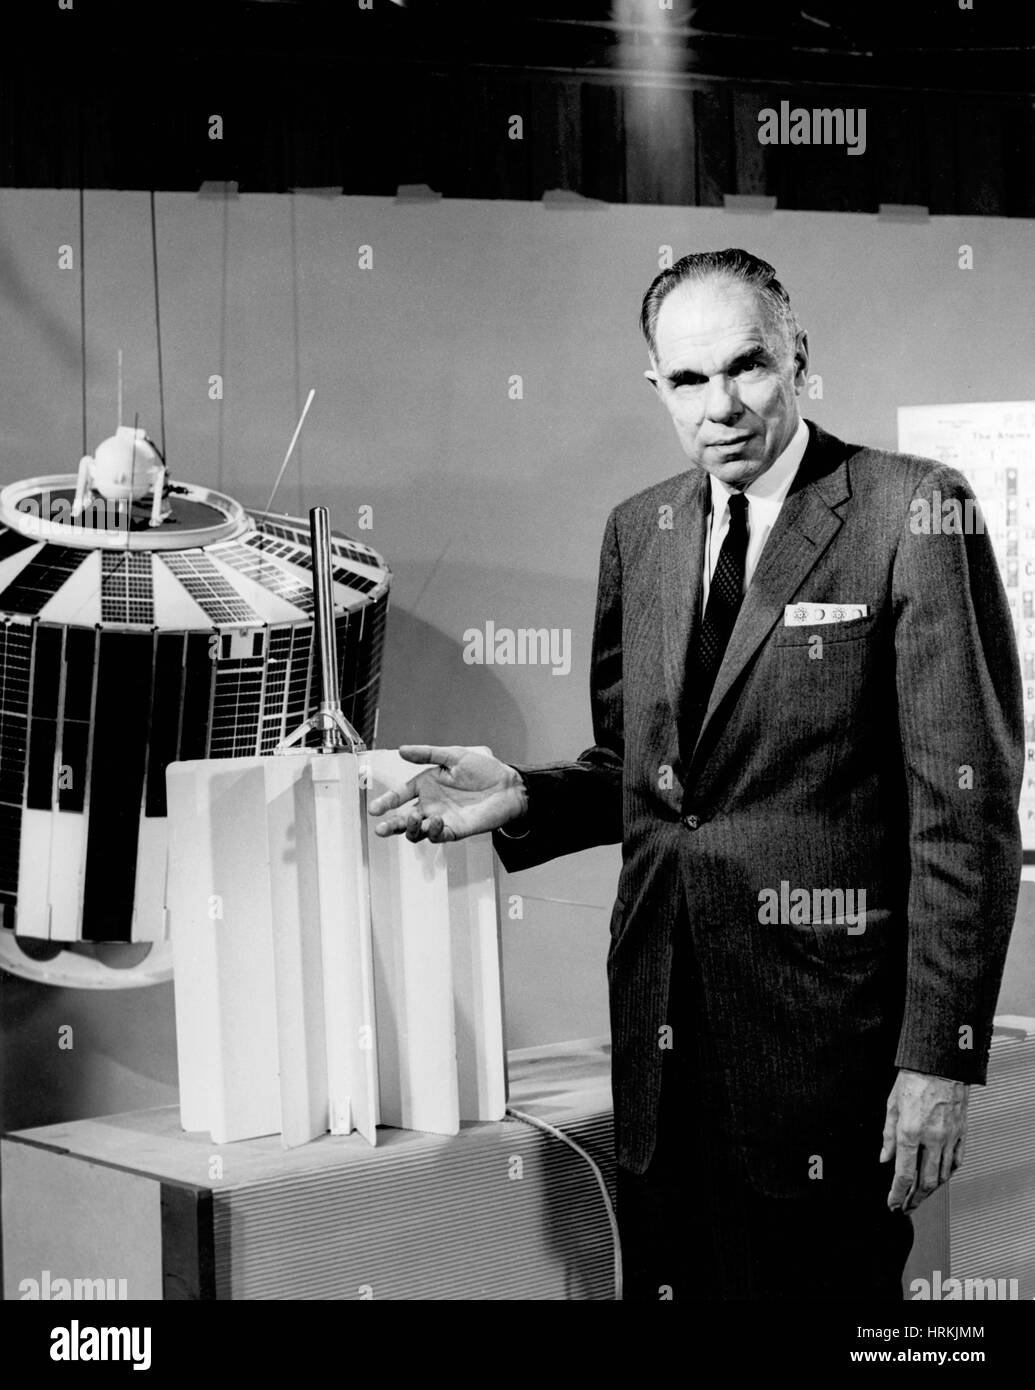 Glenn T. Seaborg, American Nuclear Chemist Stock Photo - Alamy